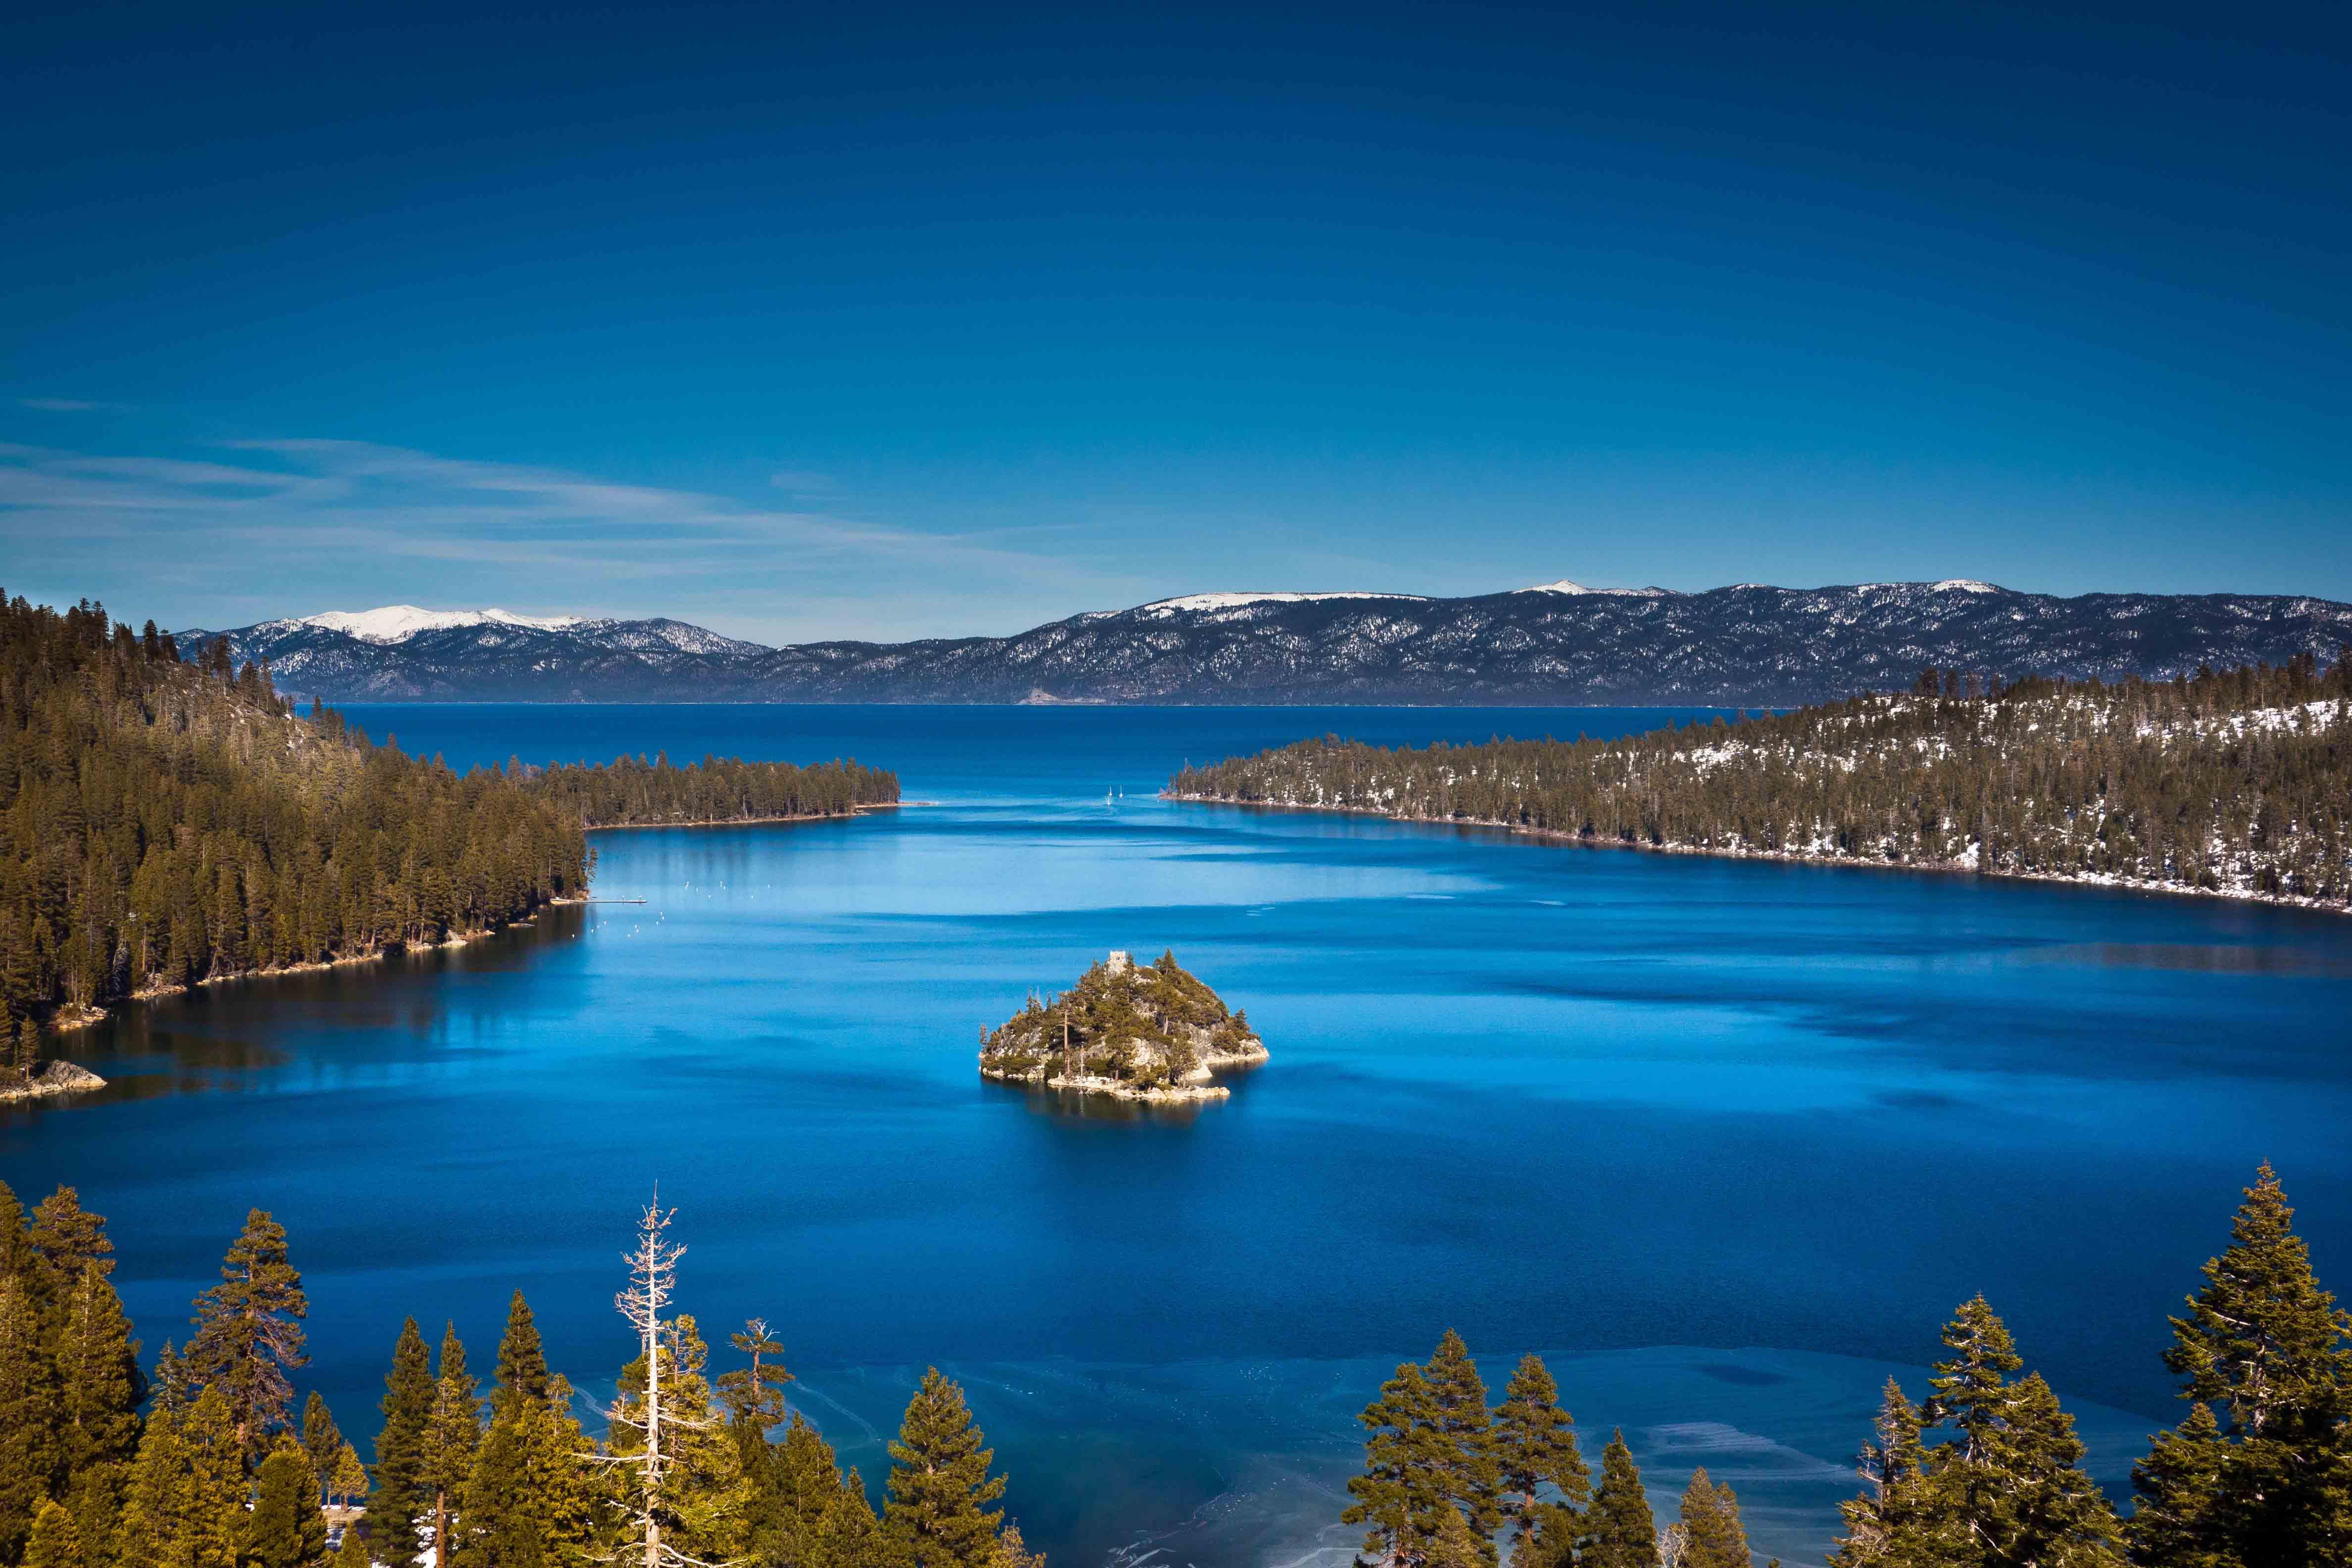 Tahoe Island South Lake Tahoe